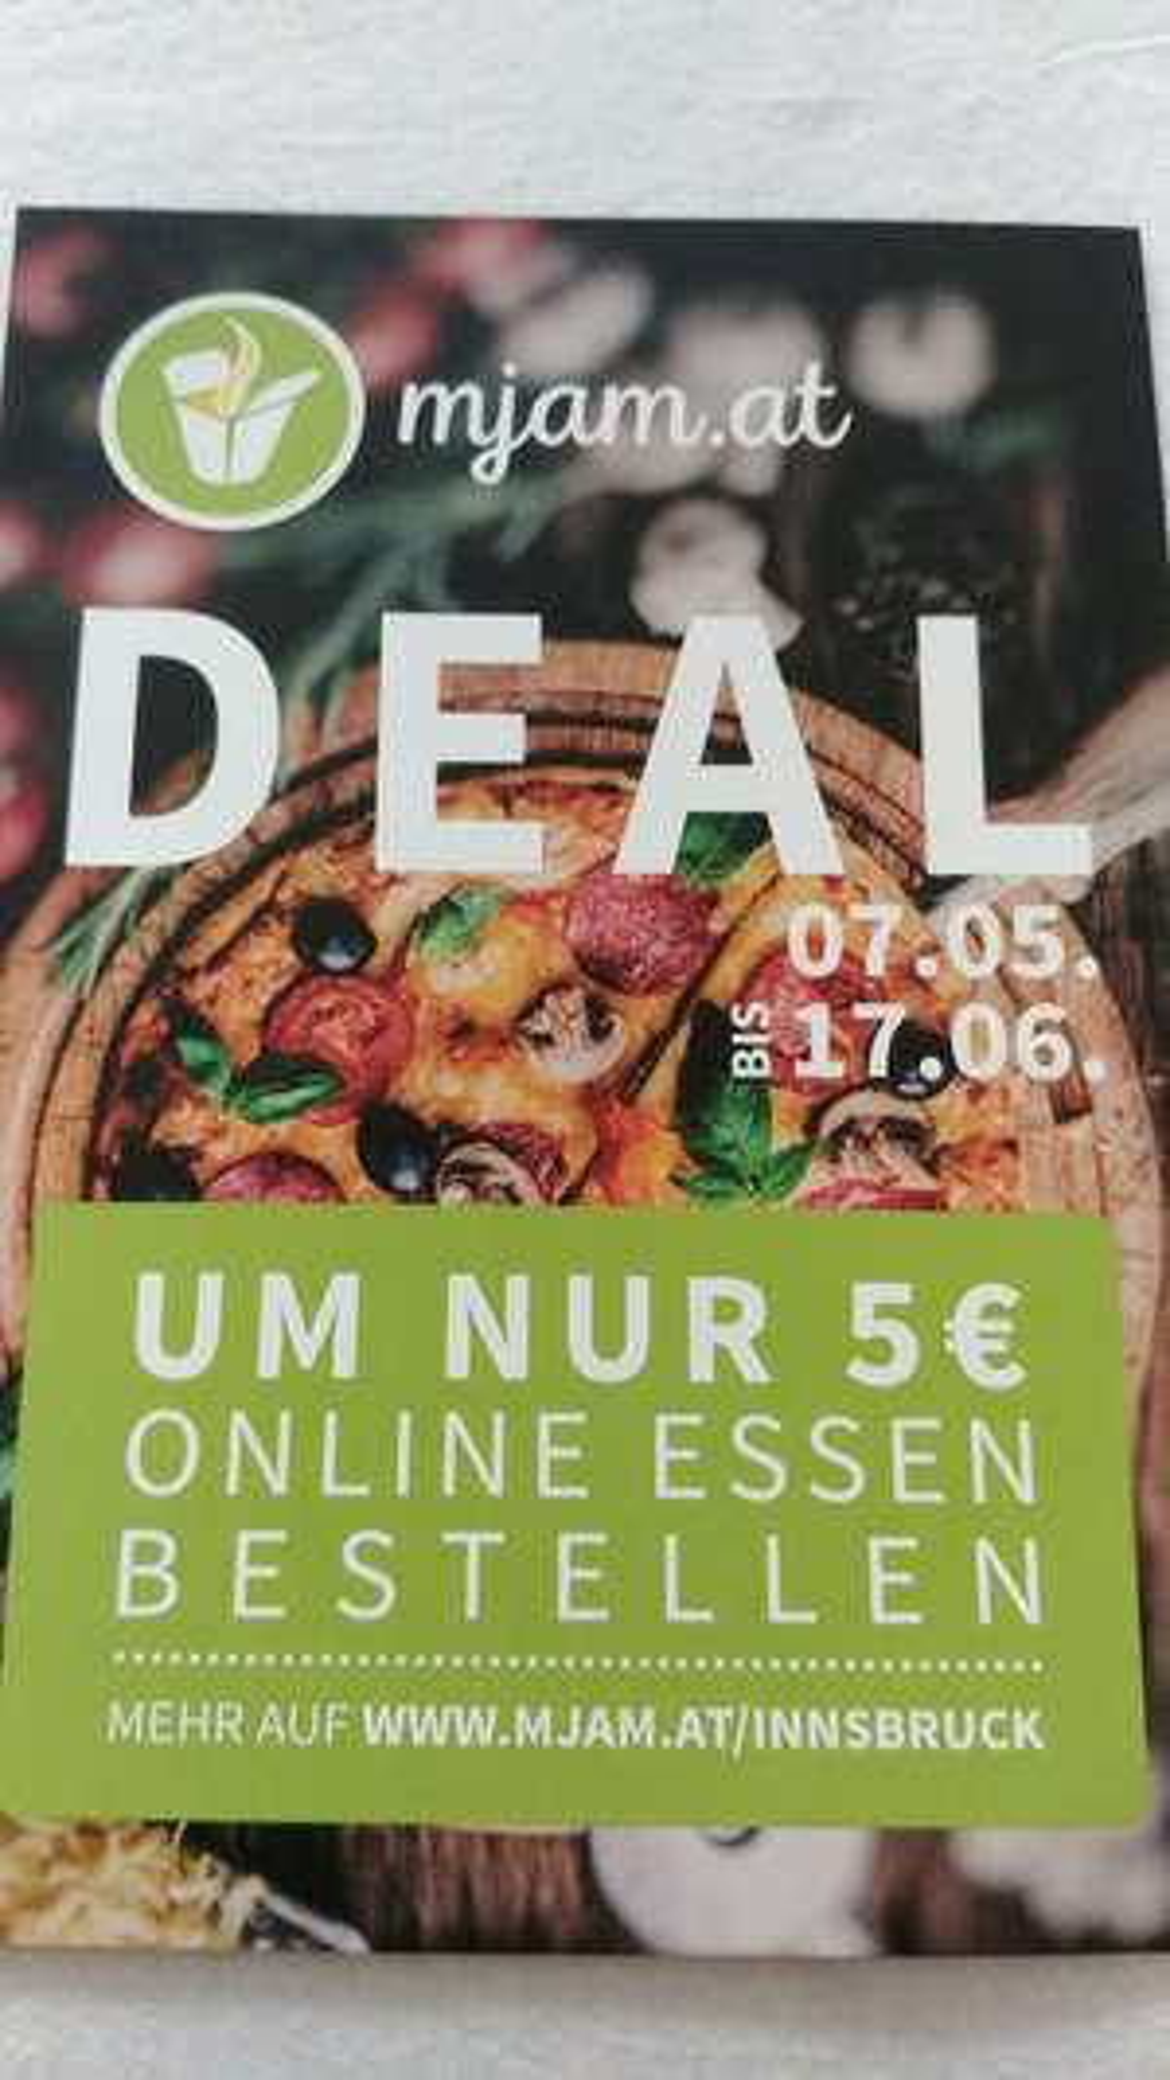 Innsbruck: Mjam.at Deal